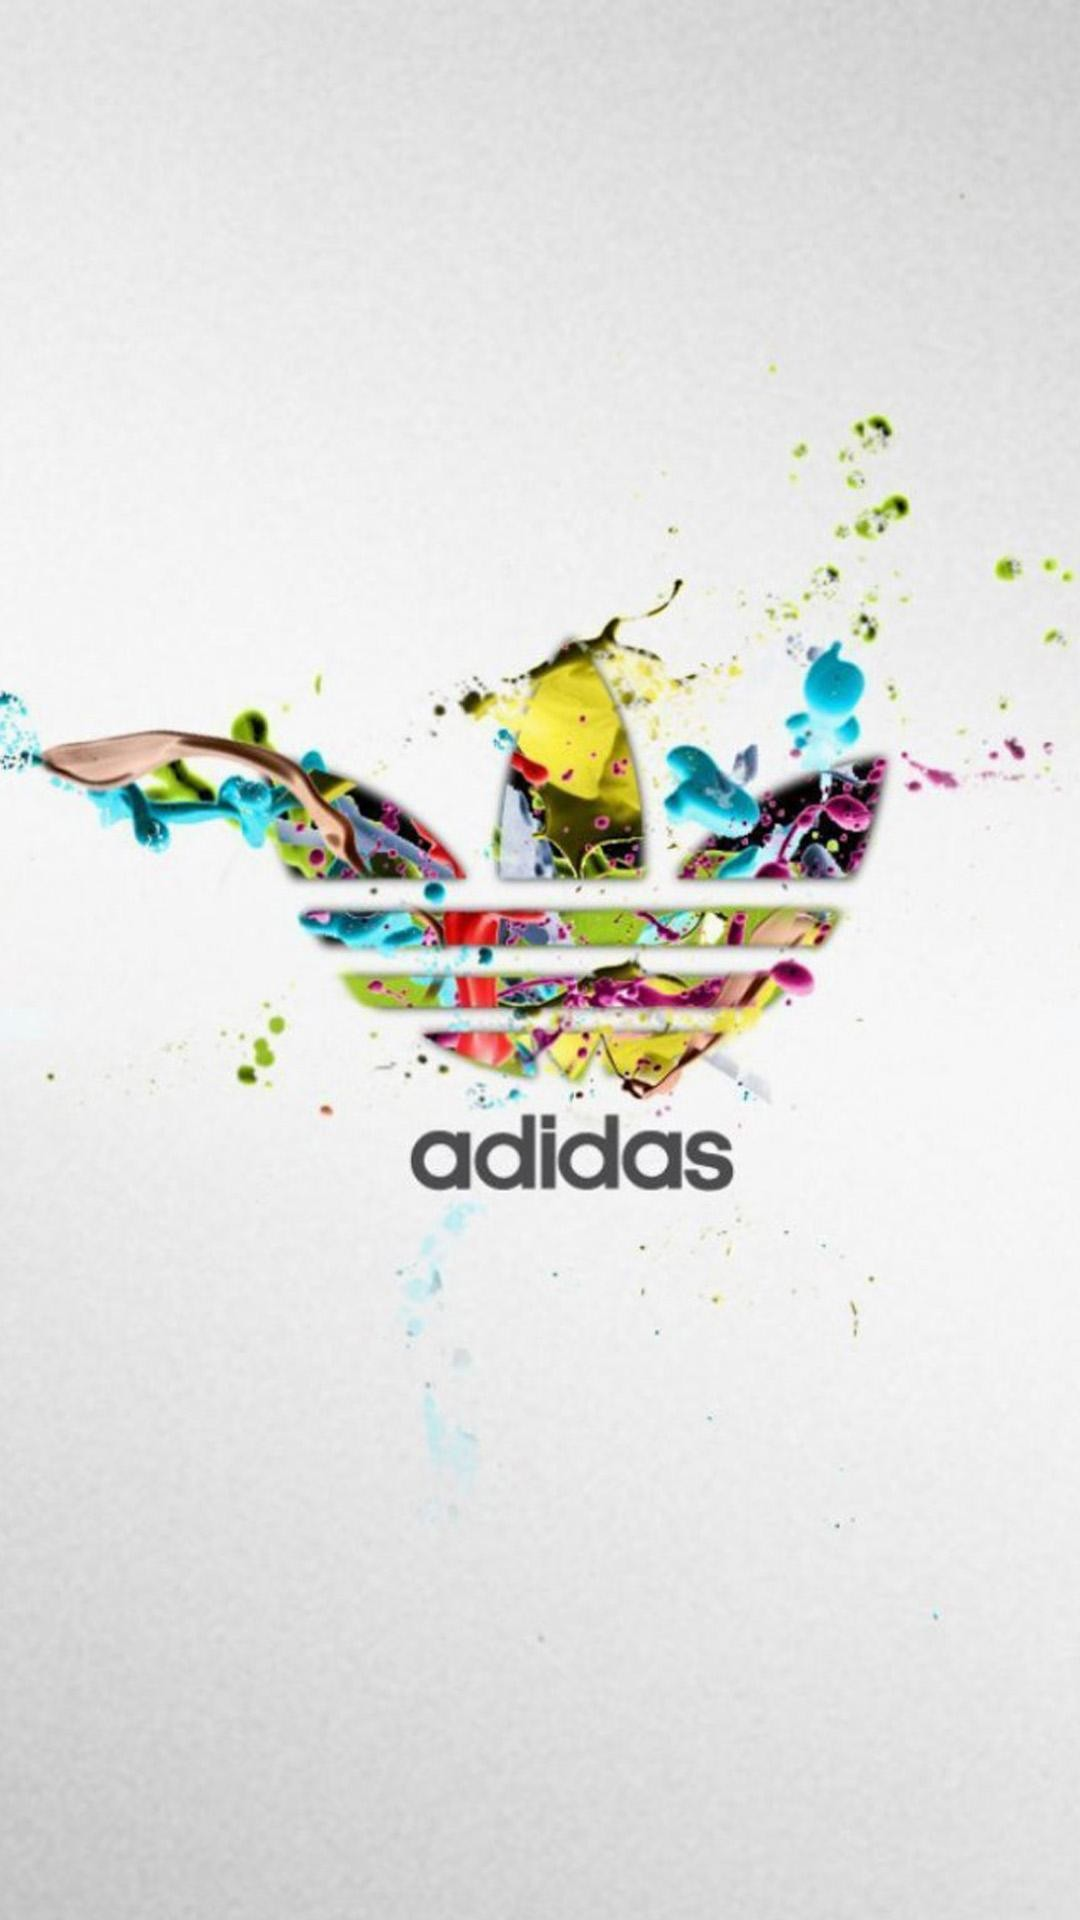 wallpaper.wiki-HD-Adidas-Iphone-Wallpaper-PIC-WPC0014233